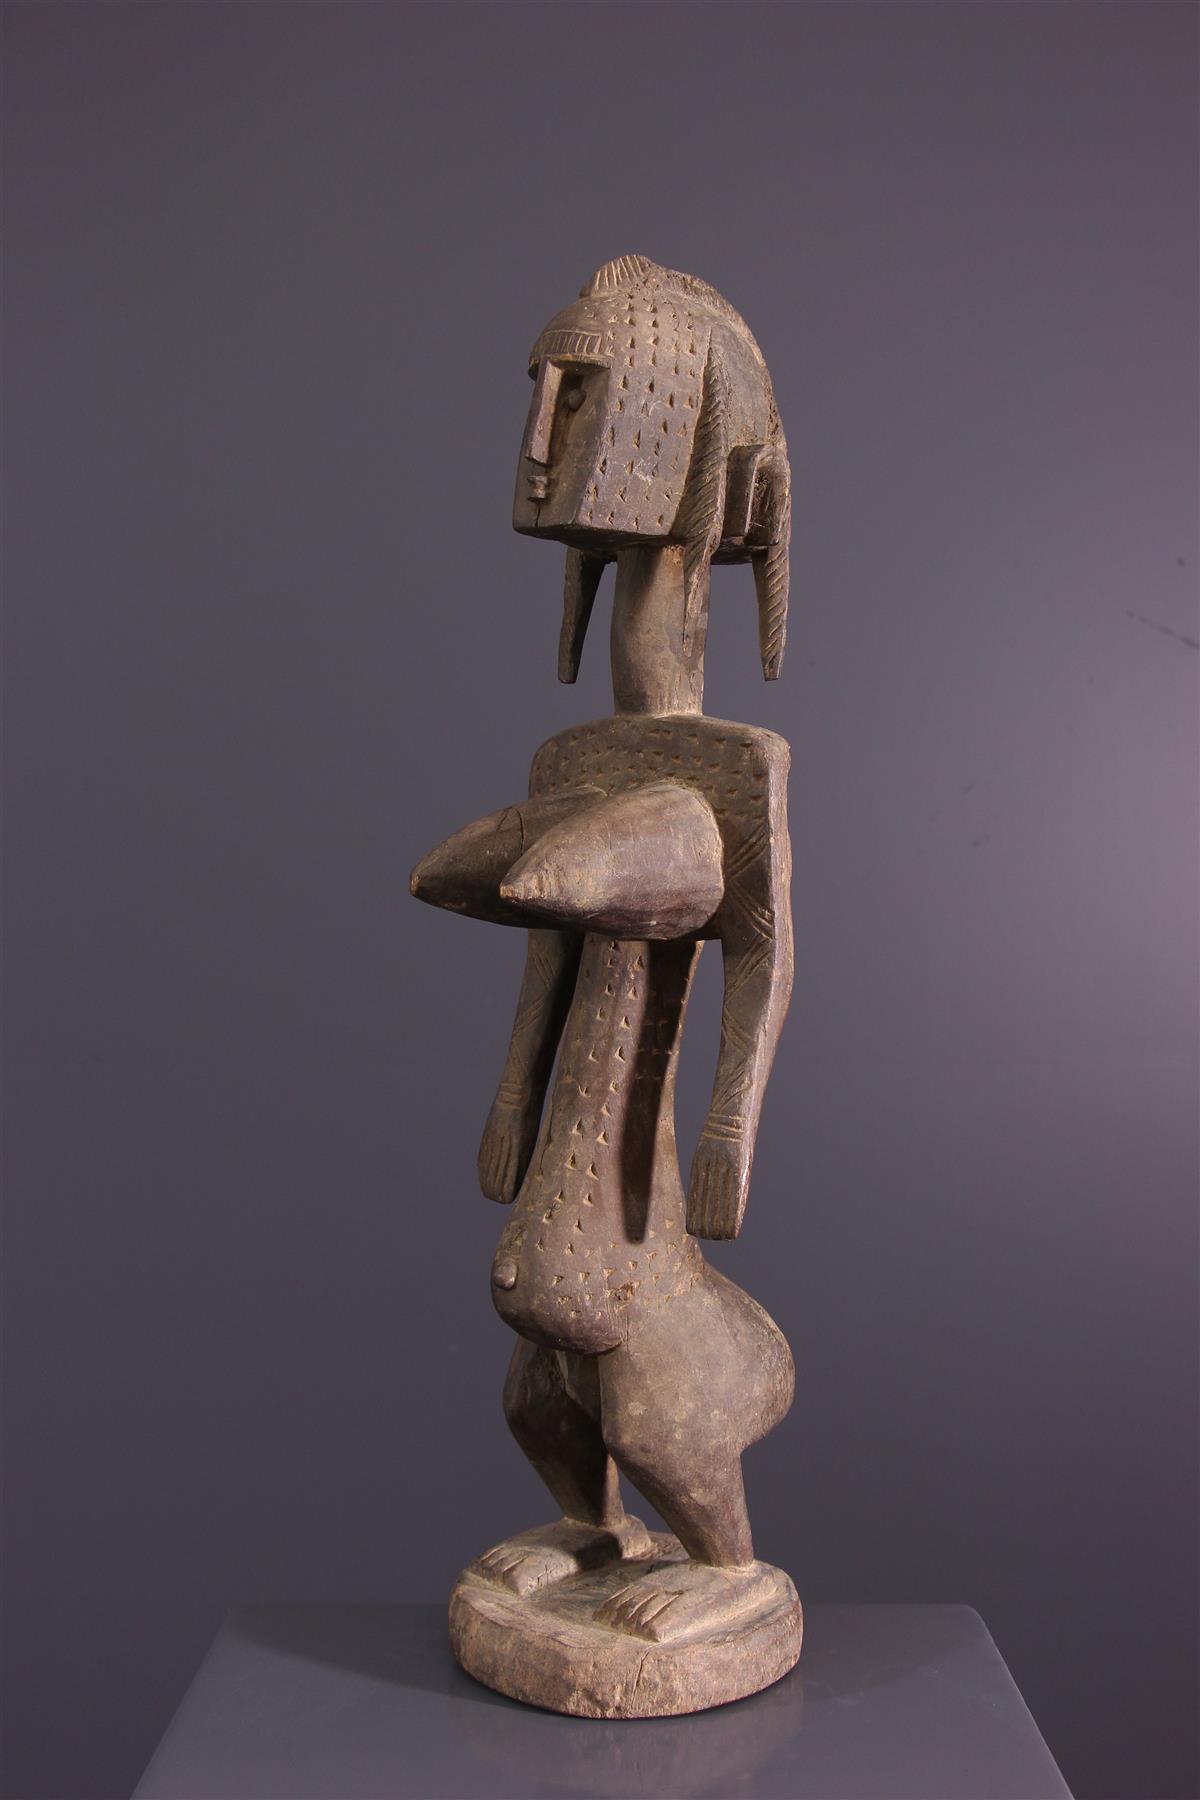 Statuette Nyeleni - African art